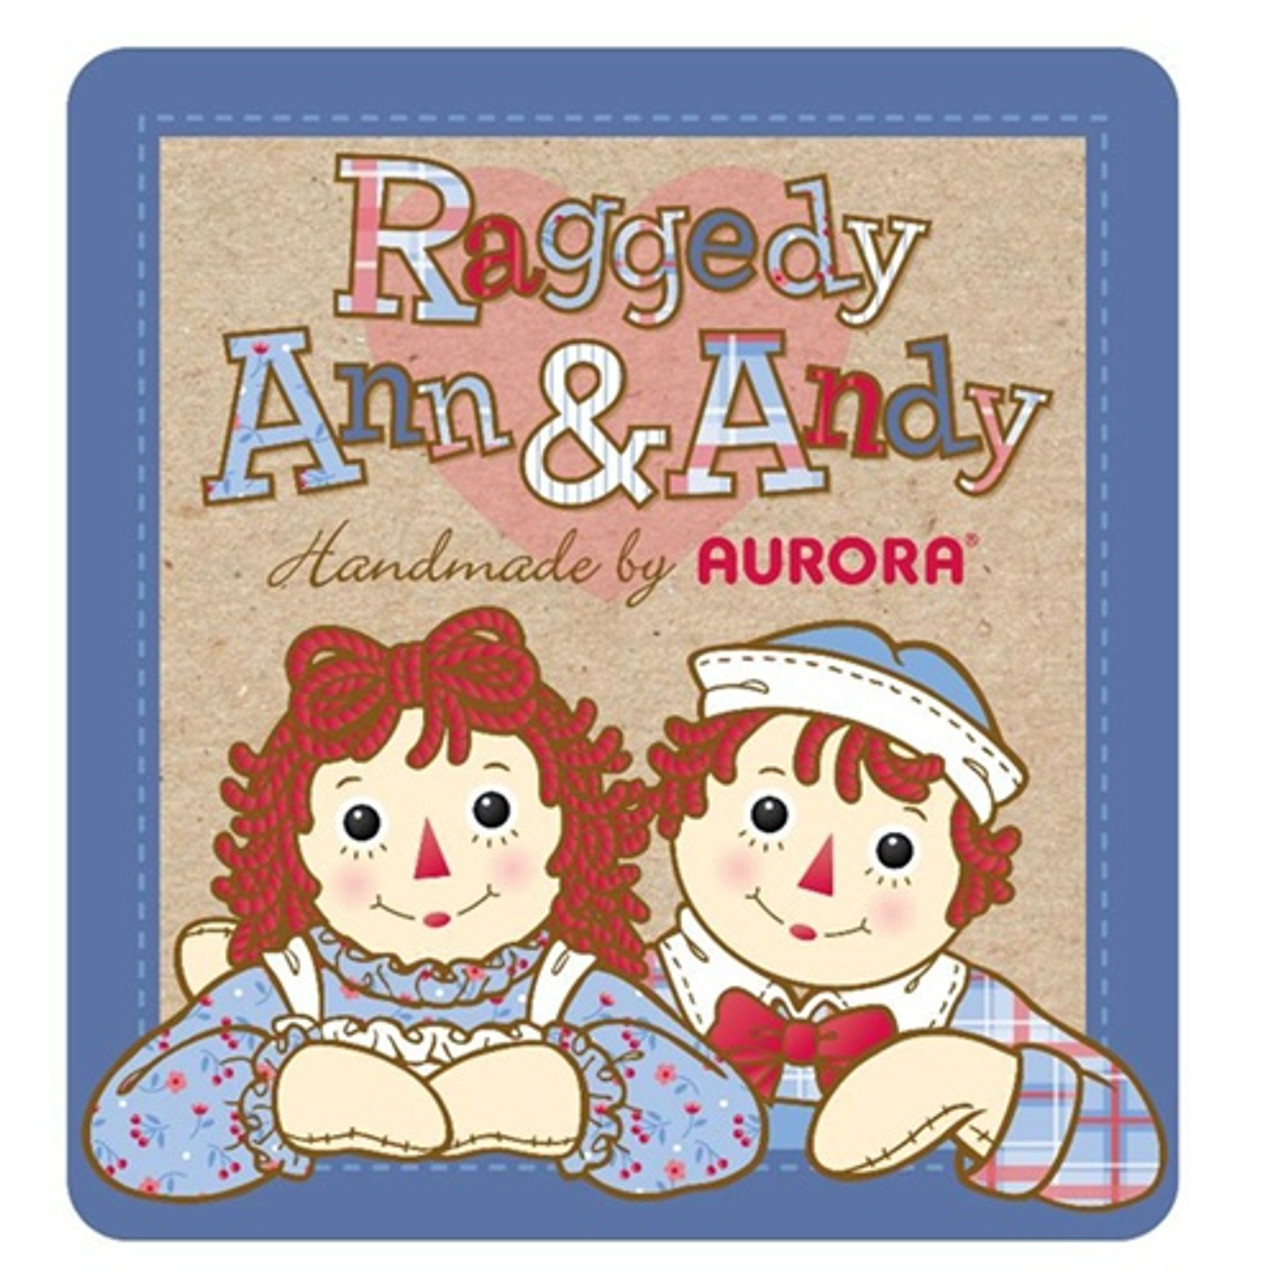 Raggedy Ann & Raggedy Andy